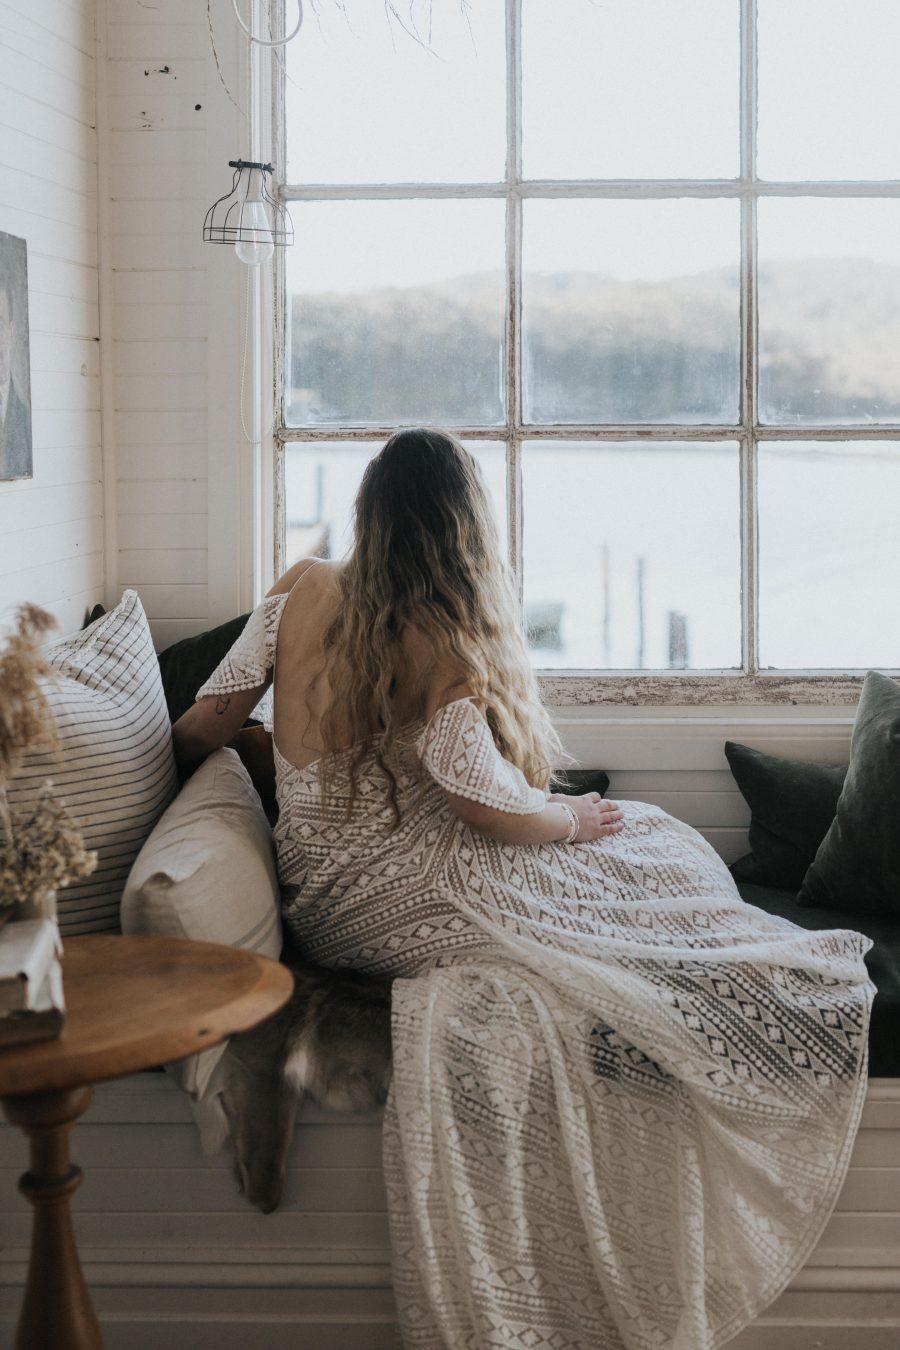 Bride in rustic house - Captains Rest Tasmania / Elopement photography